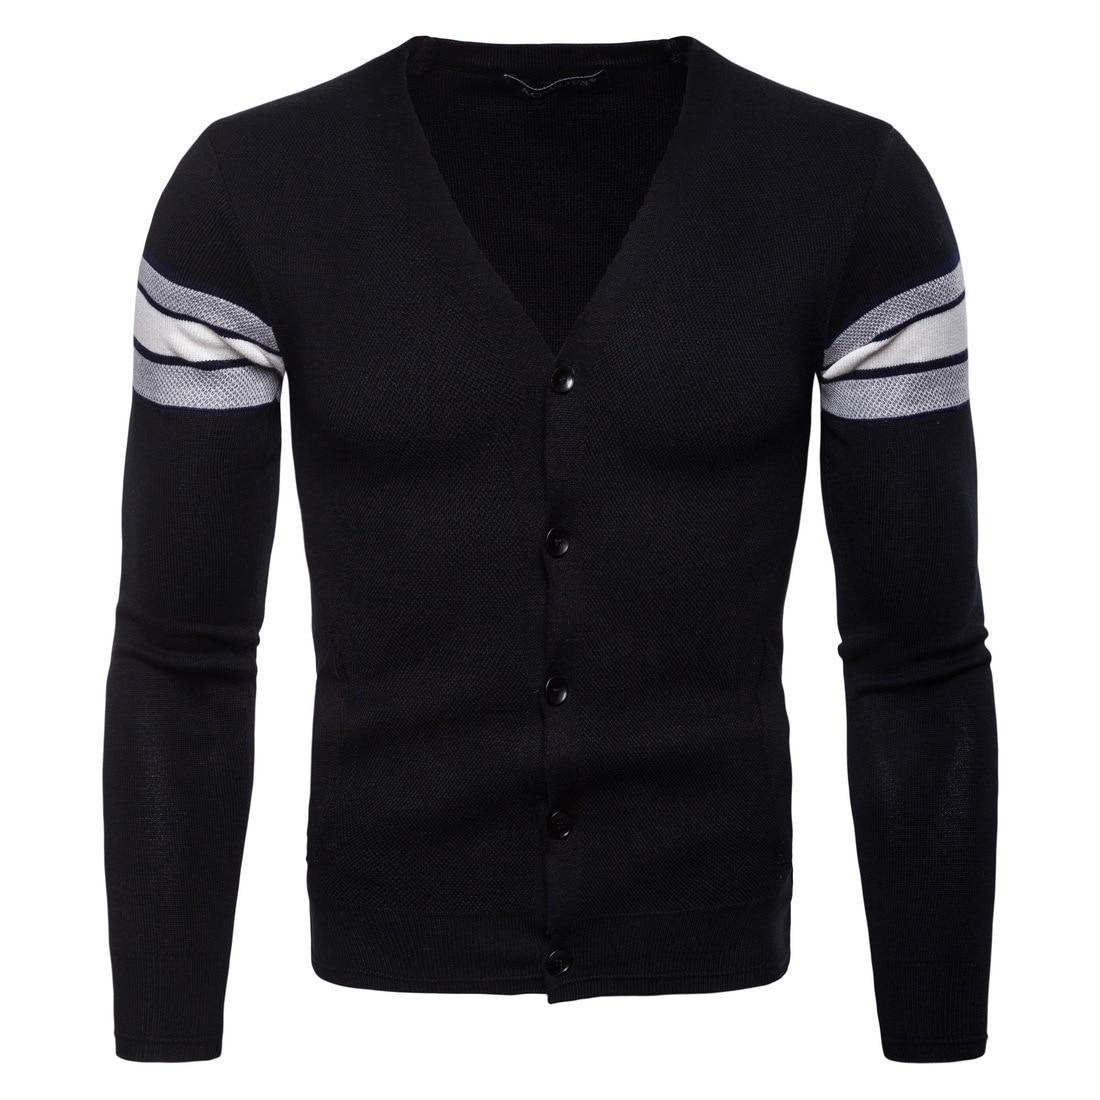 2018 Männer Pullover Schwarz Herbst Männer Strickjacke Blusen V Kragen Pullover Jersey M-xxl